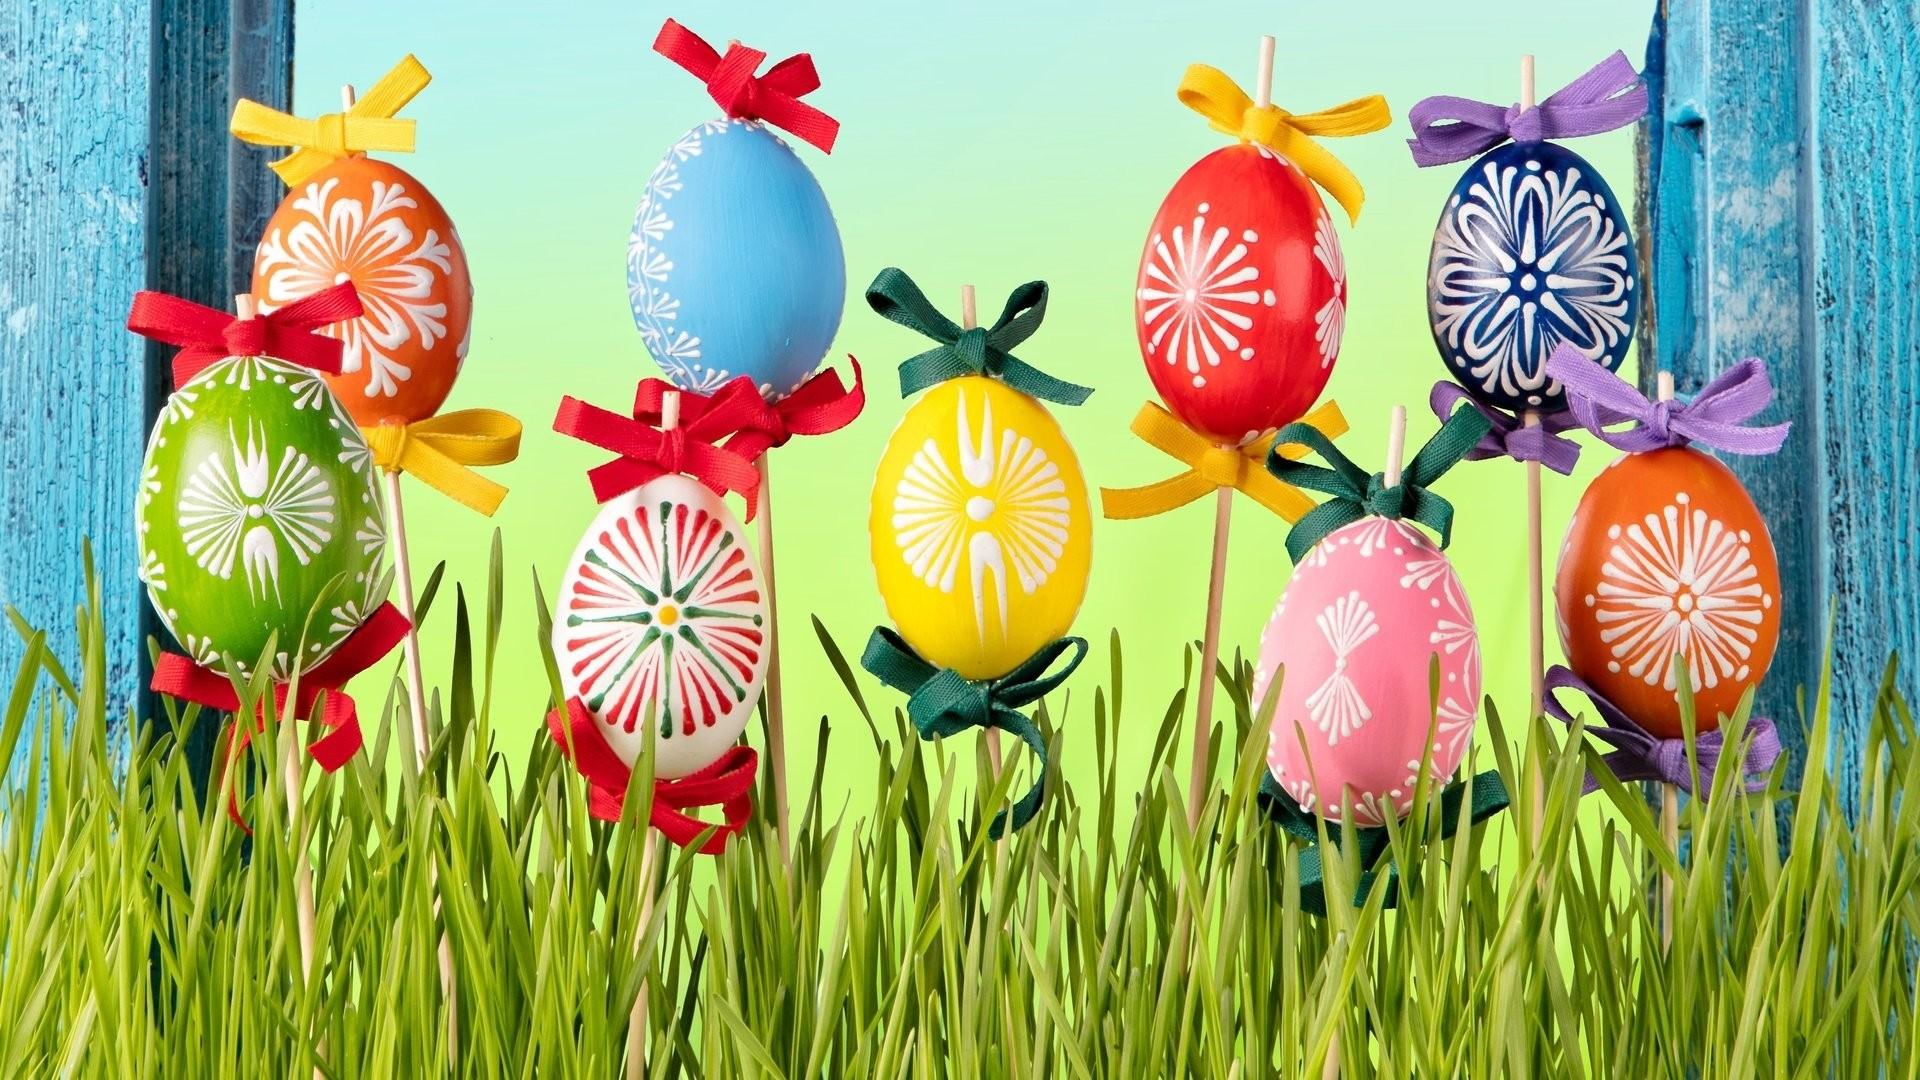 Easter Egg Decoration Pic